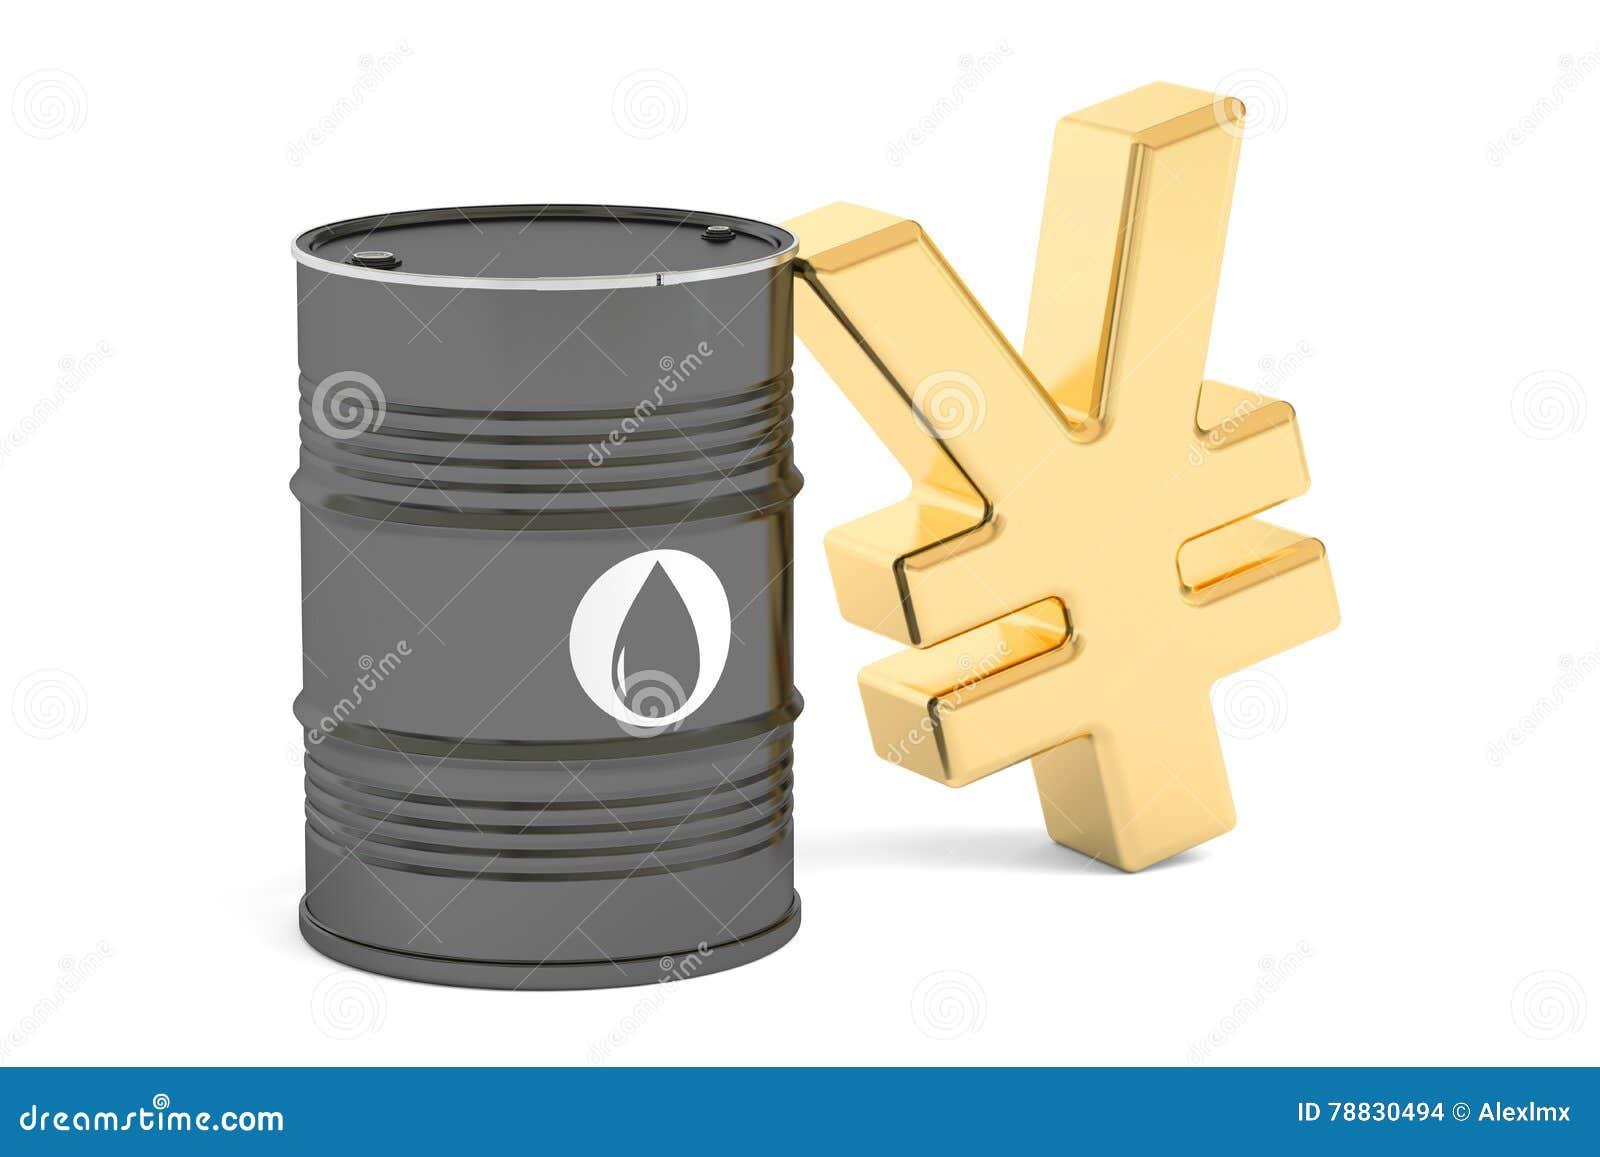 Oil barrel and yuan symbol 3d rendering stock illustration oil barrel and yuan symbol 3d rendering biocorpaavc